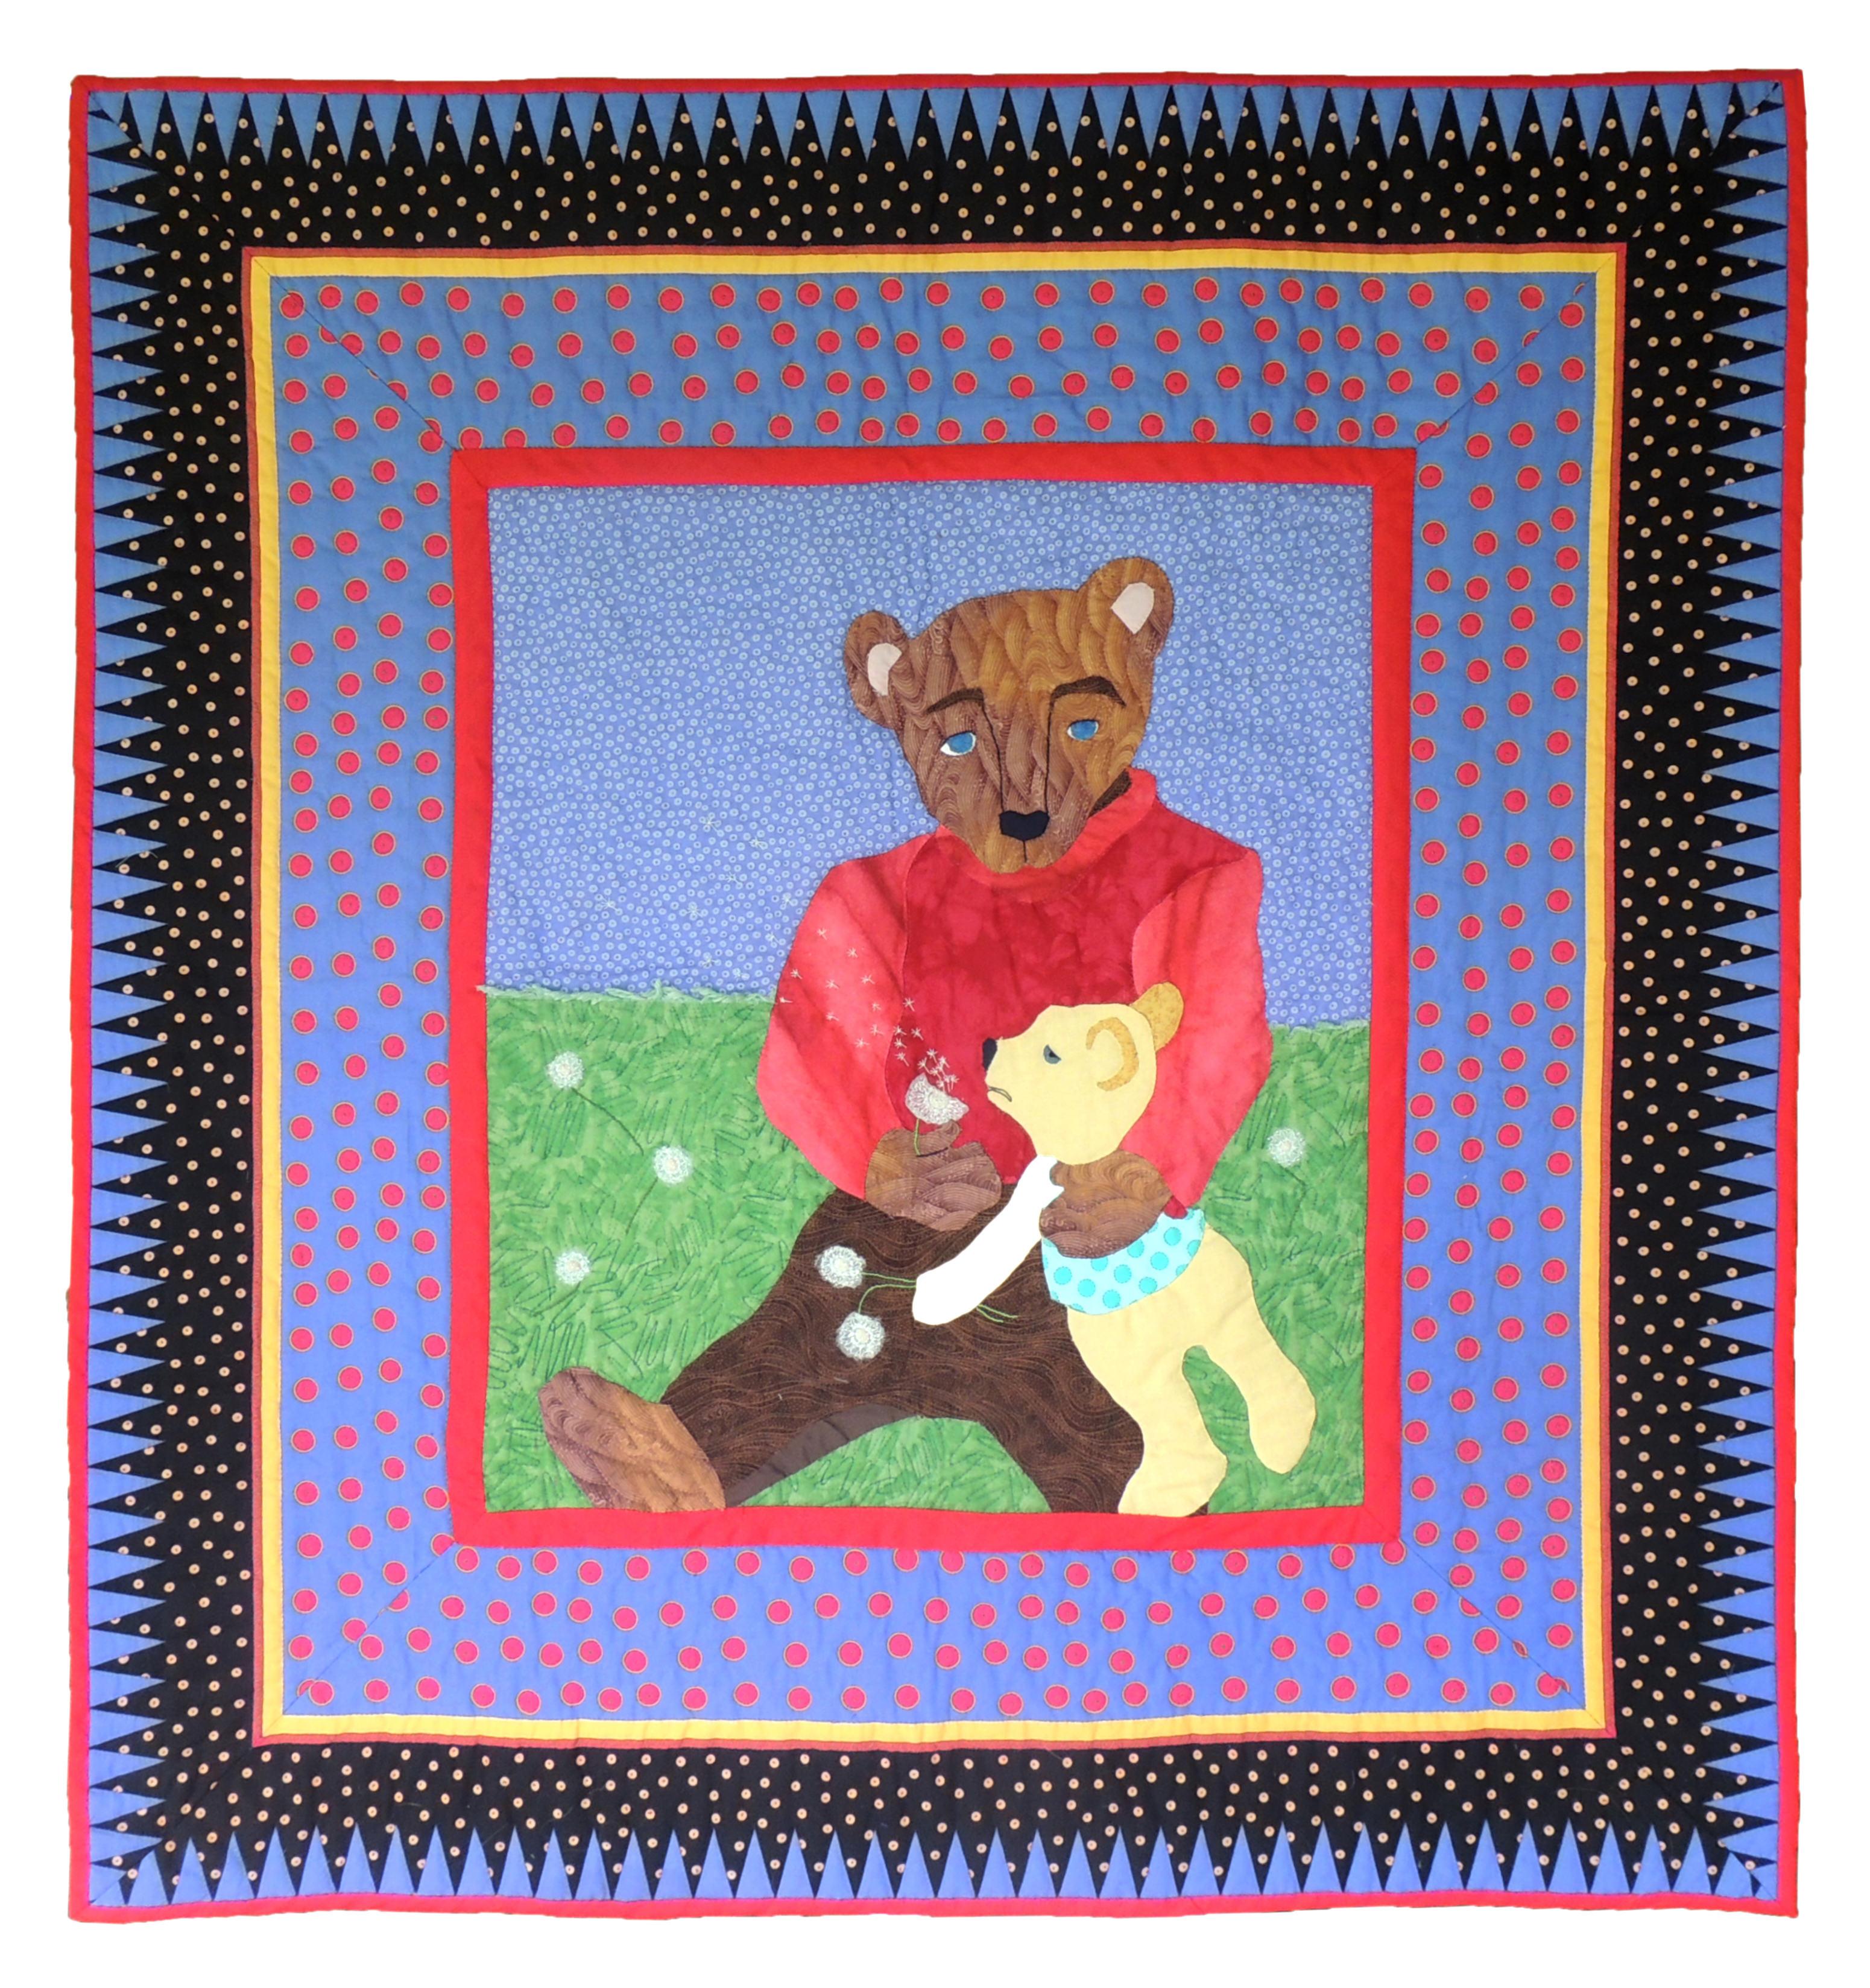 "Marianne Rabb Britton | BEAR | Fabric & Embroidery | 46.5 x 42"" | Estate of Marianne Rabb Britton"